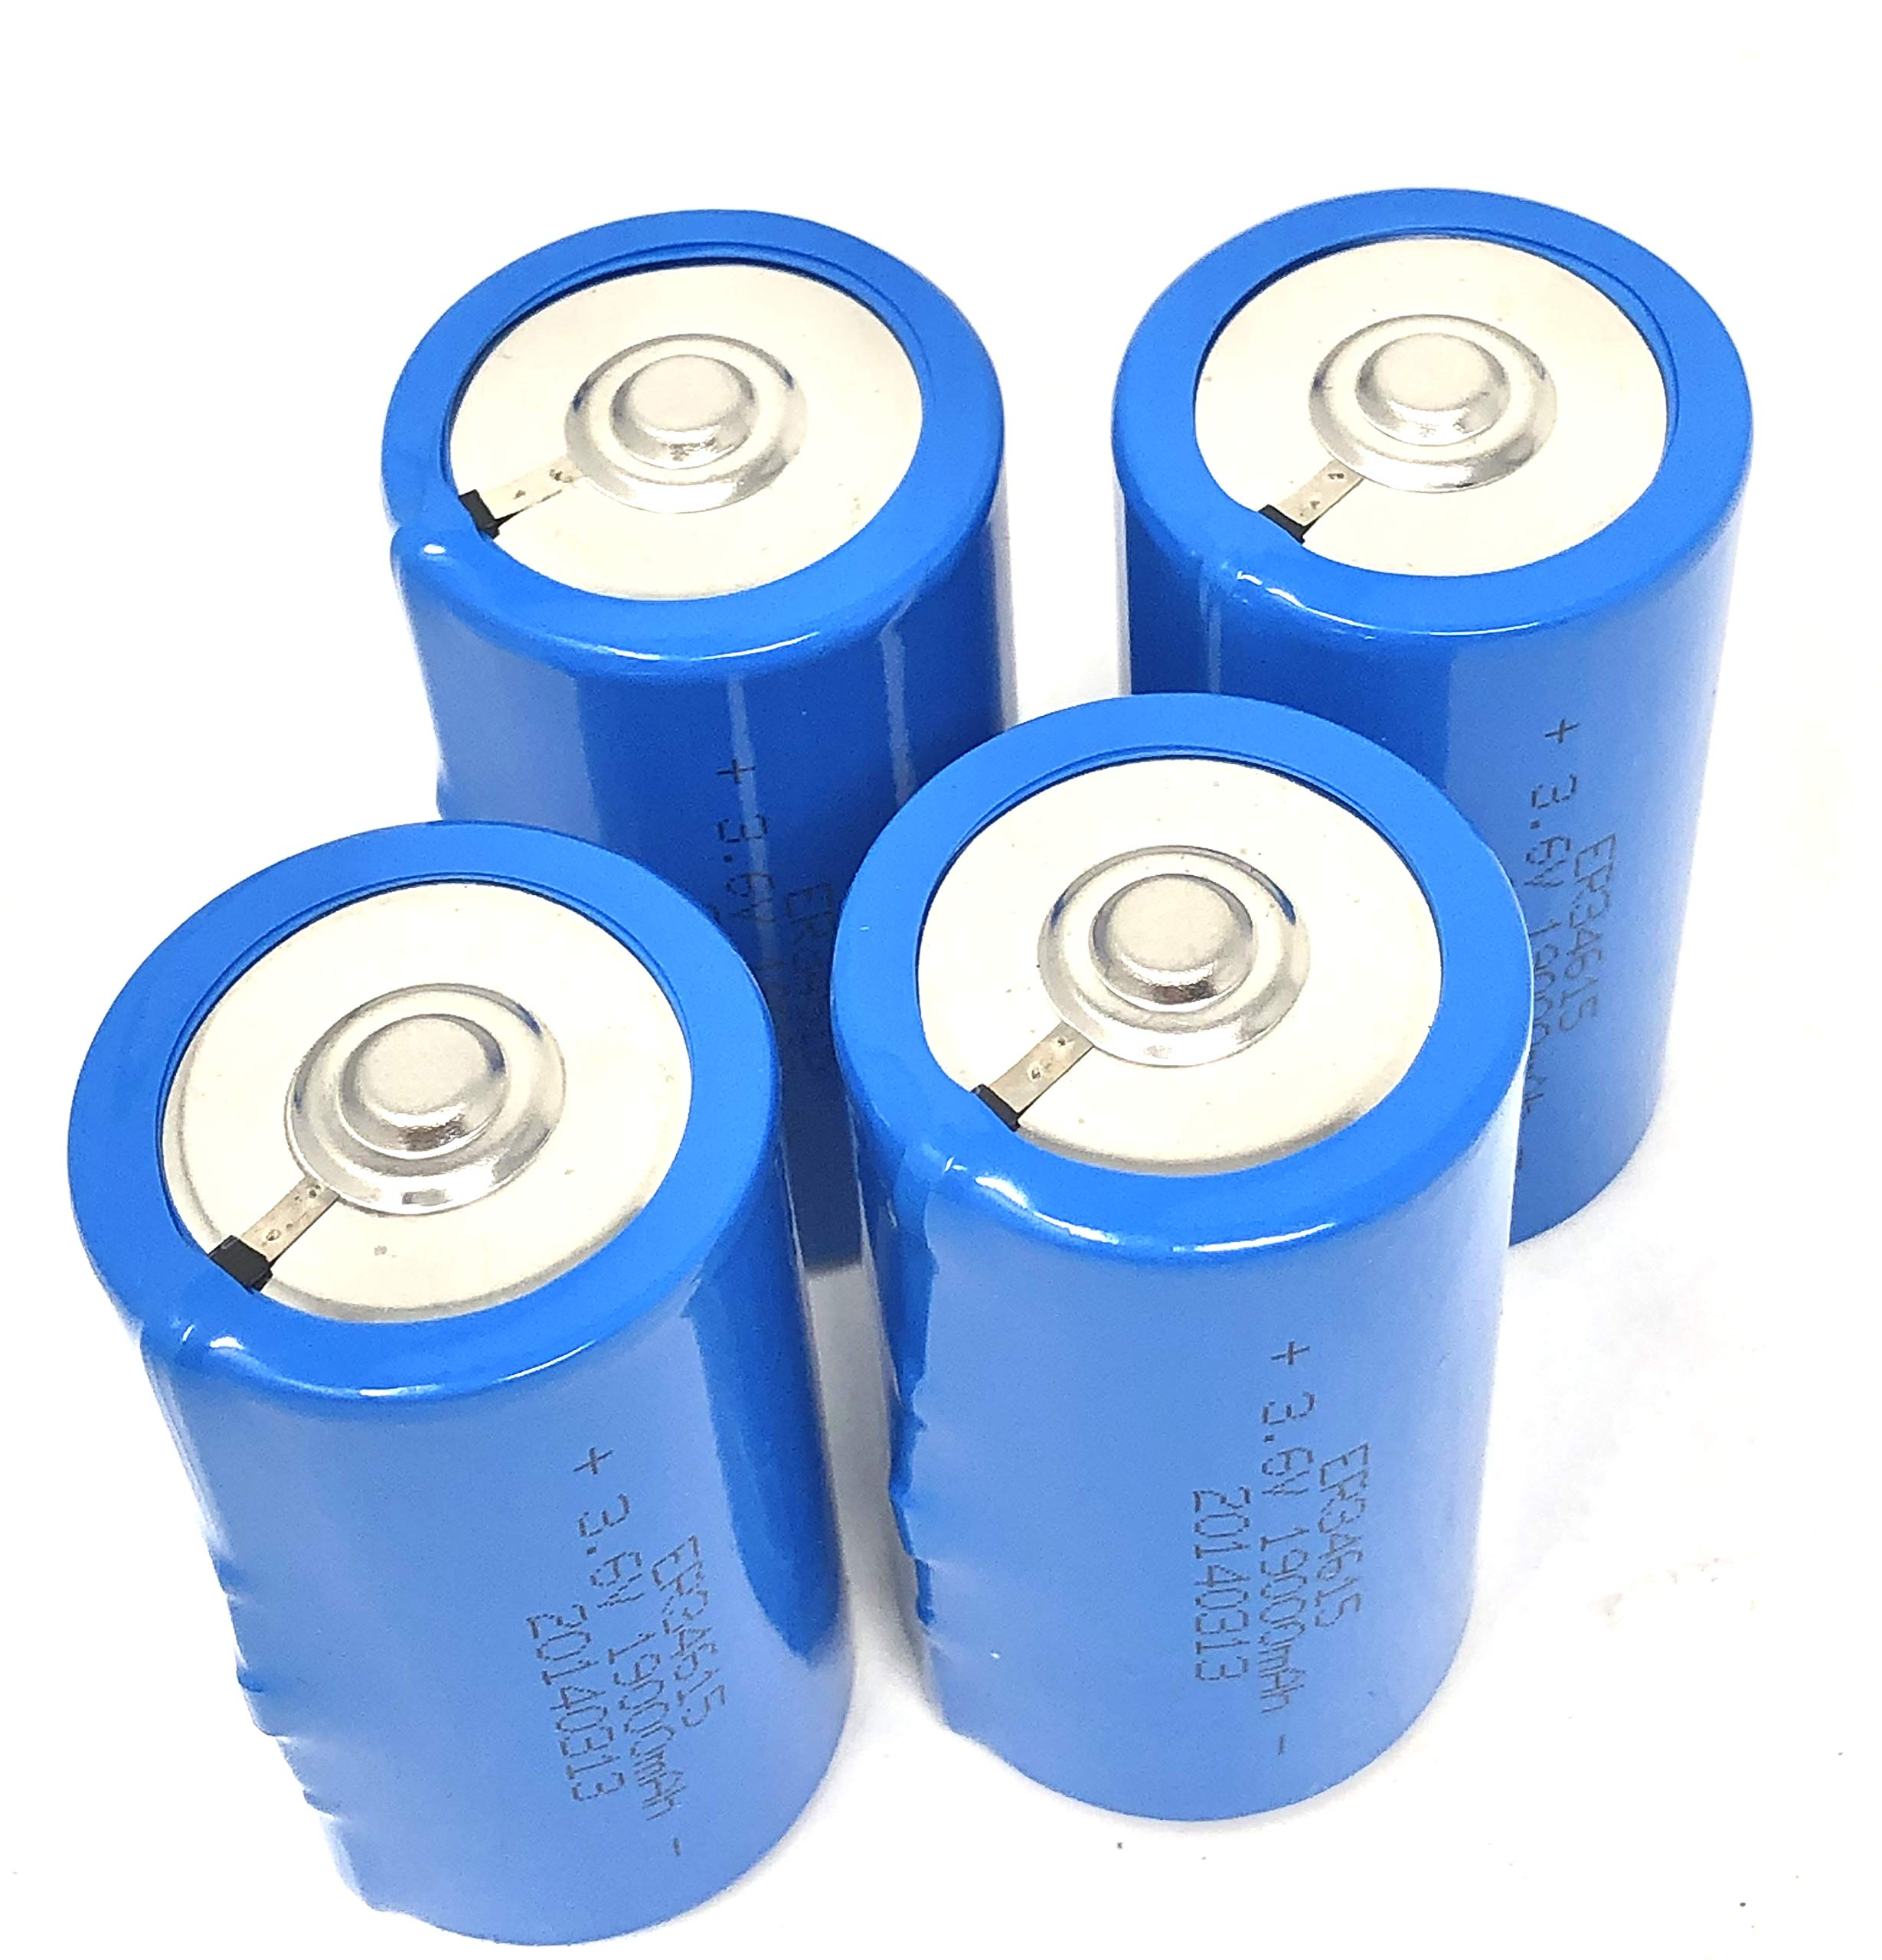 3.6V D Cell 19000mAh ER34615 Li-Socl2 Lithium Battery, 19 Ah D Size (4 pcs) by LNX